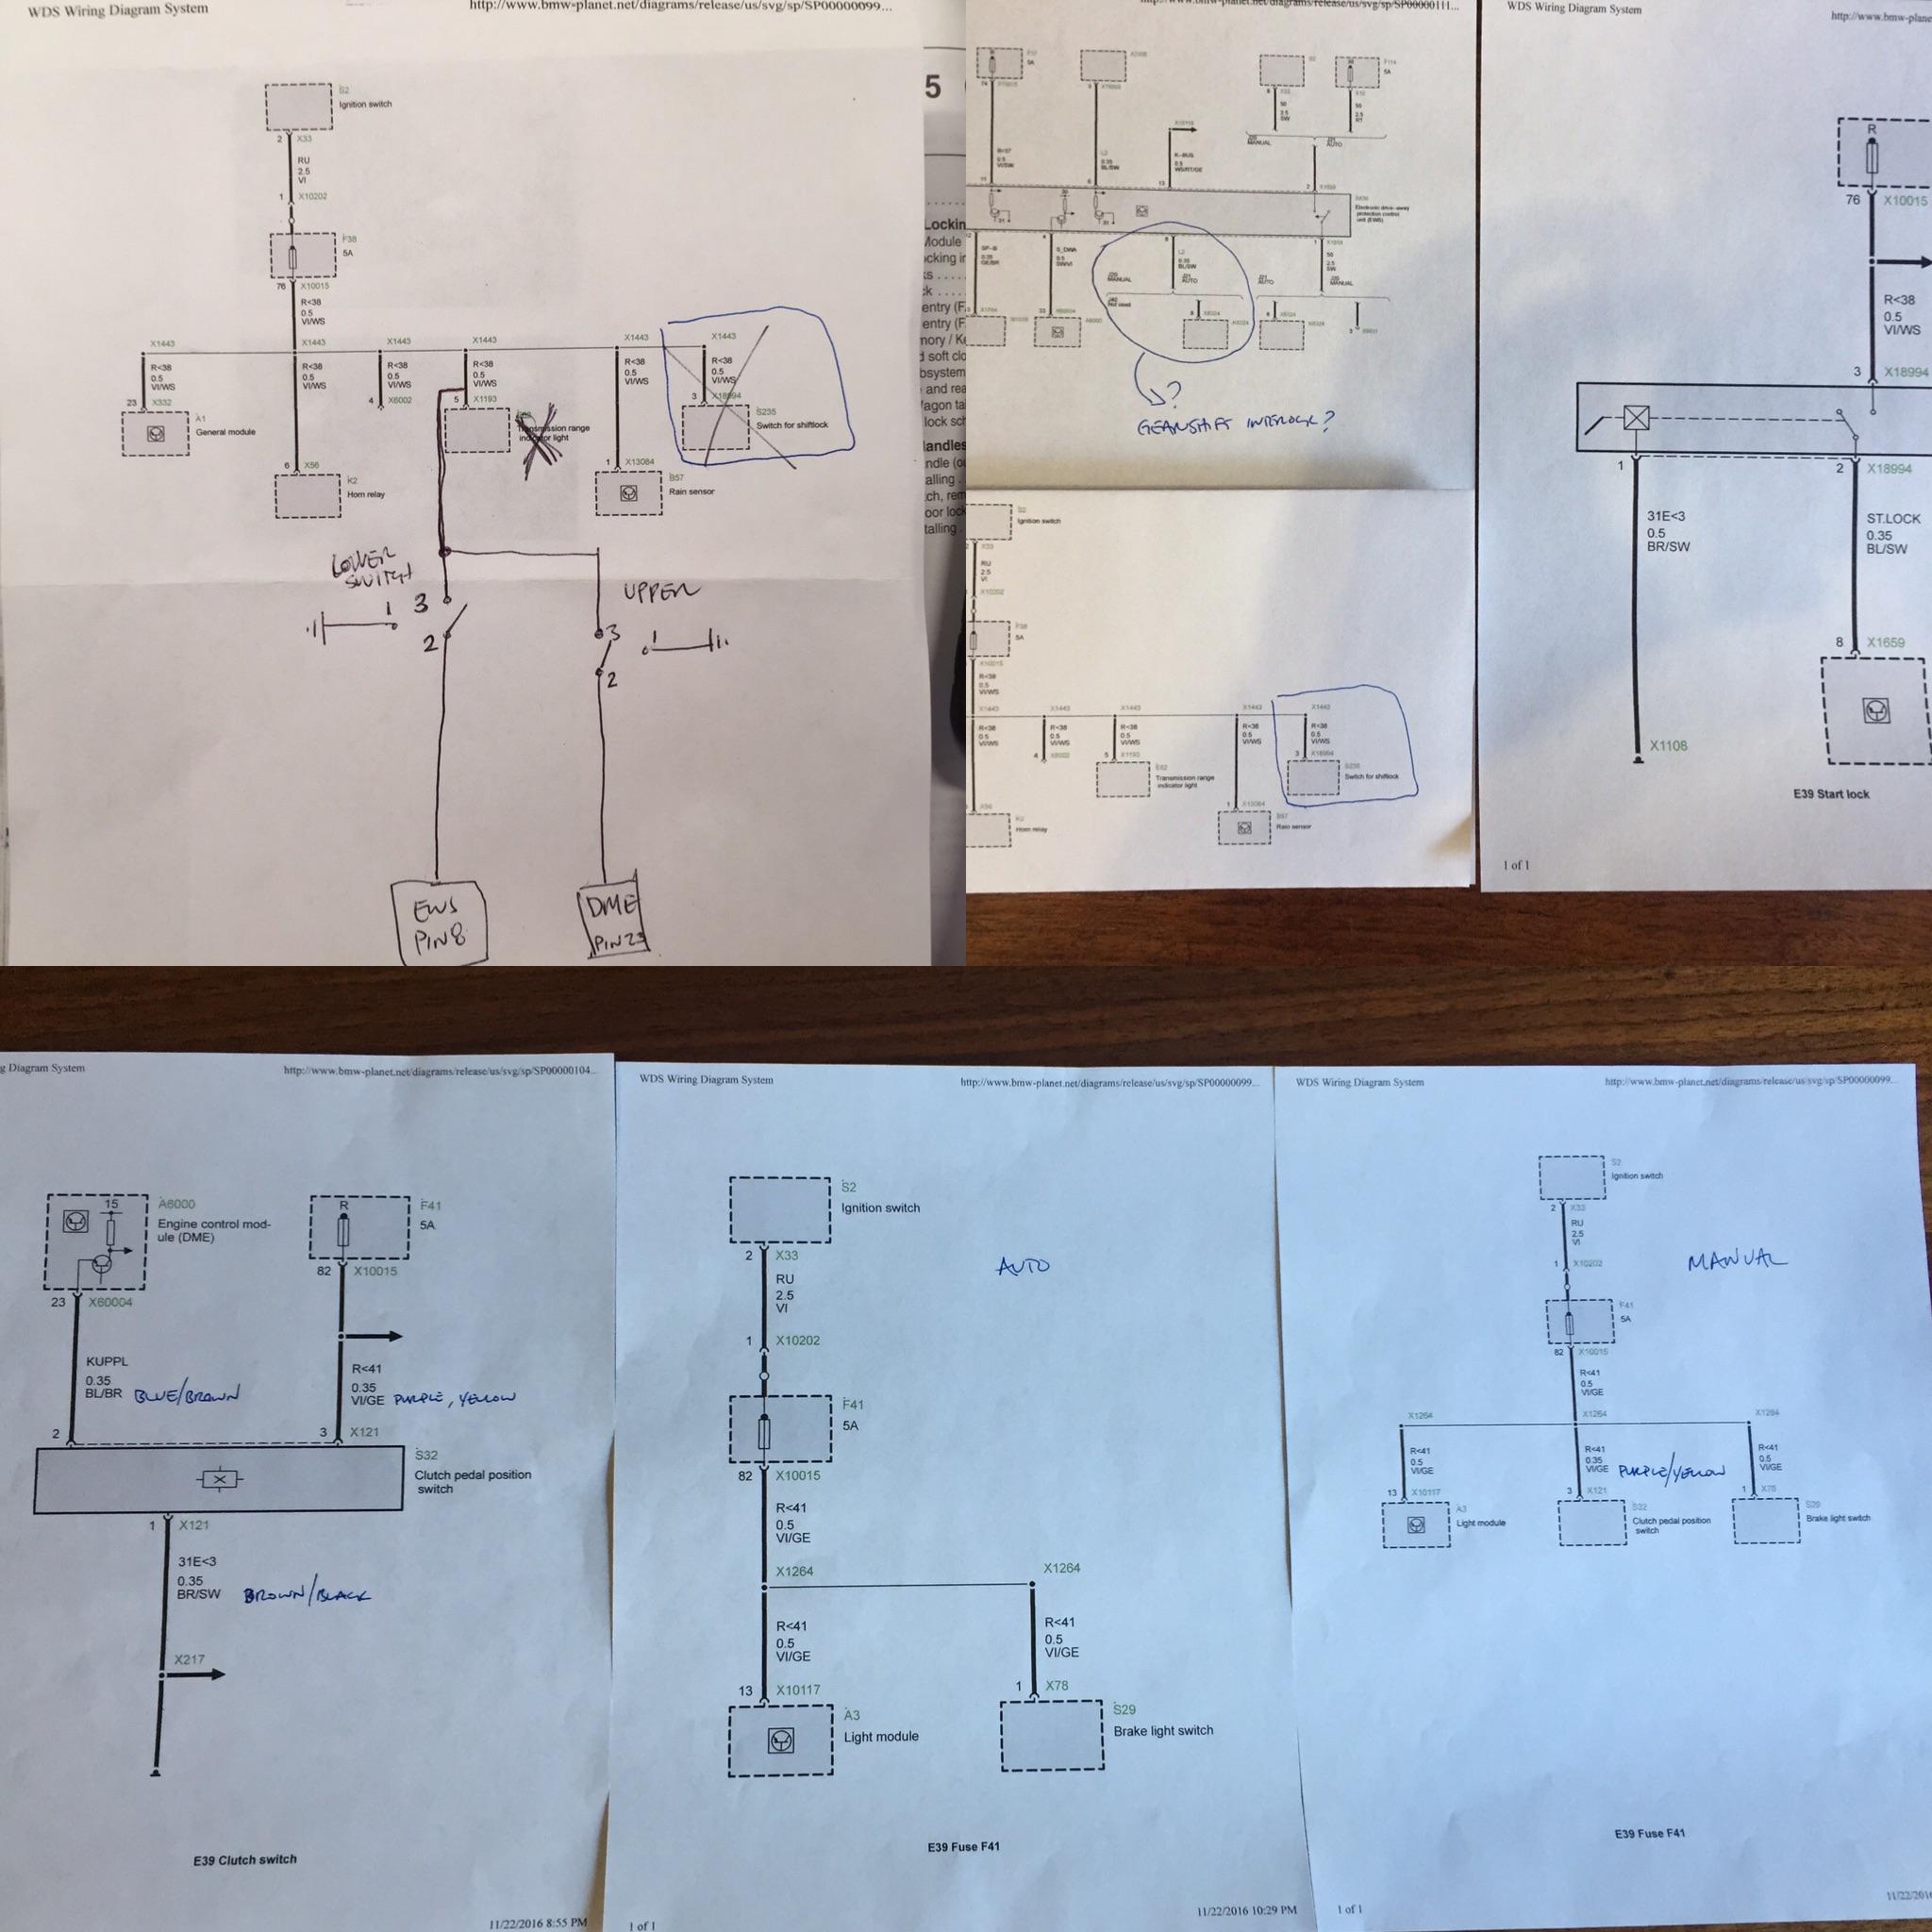 image 1?w=620 wiring diagram g80cs wiring wiring diagrams collection  at virtualis.co